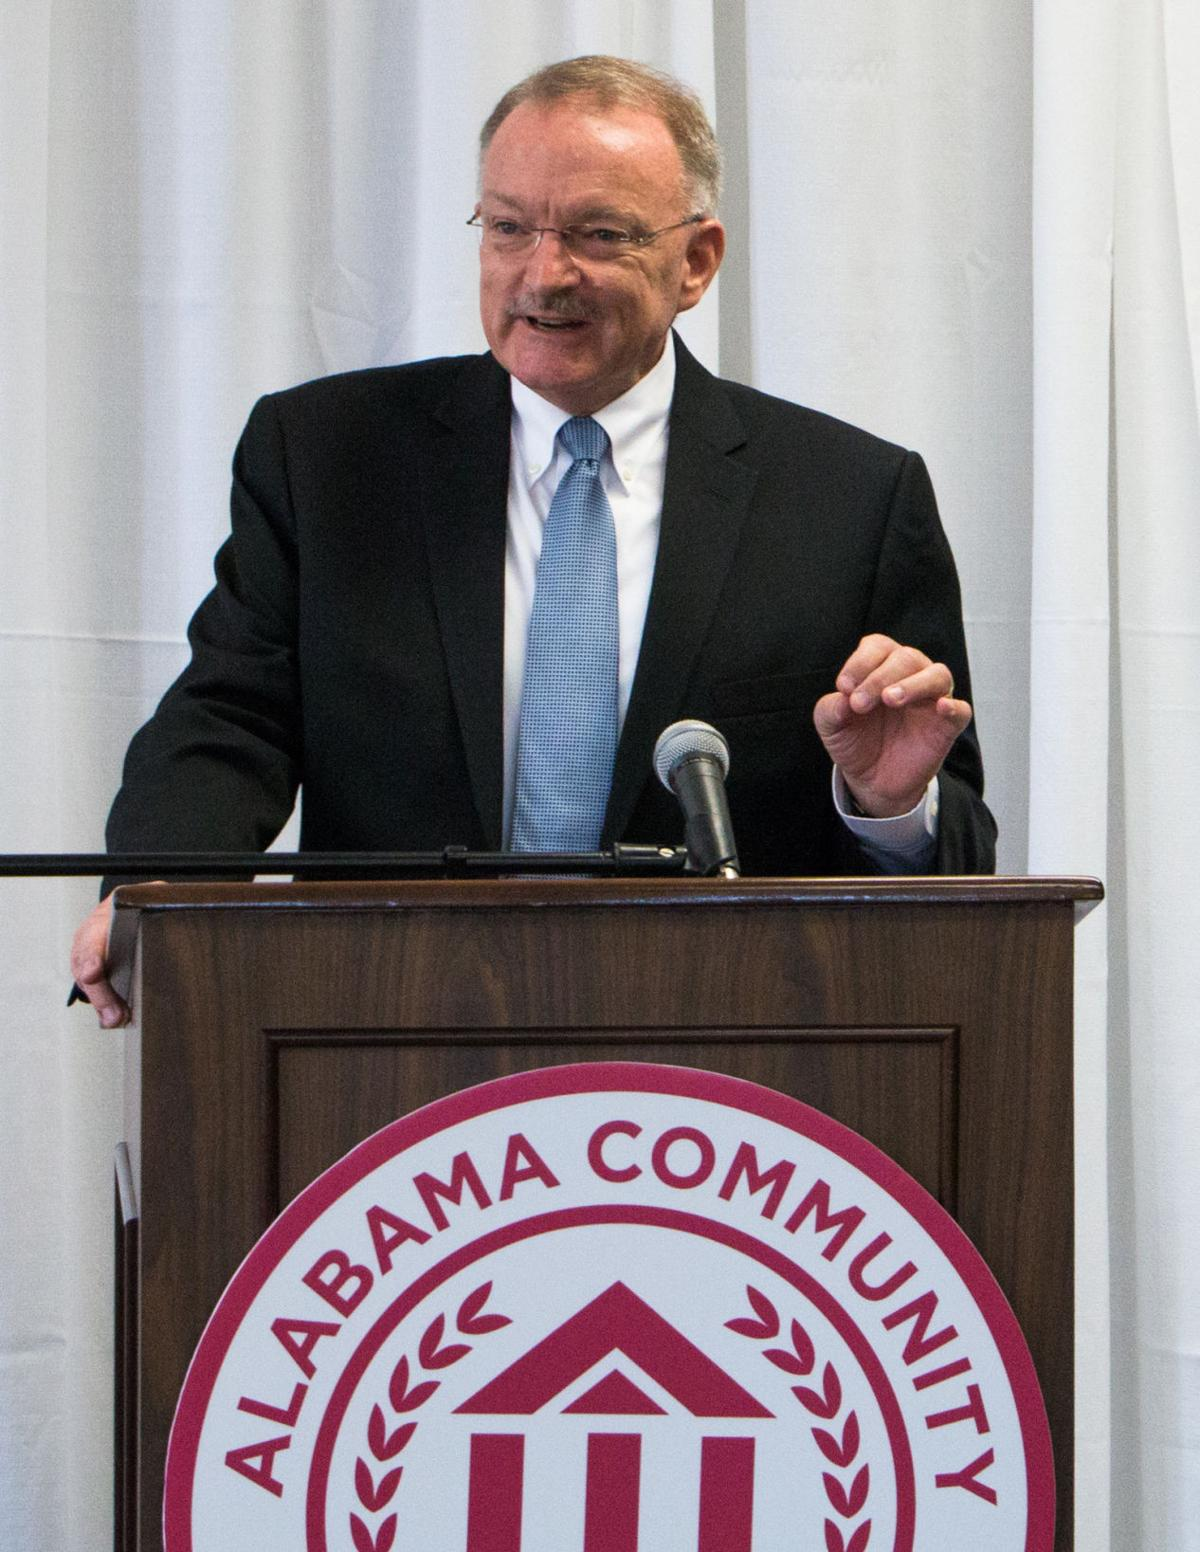 Auburn graduate named new head of community college workforce development program